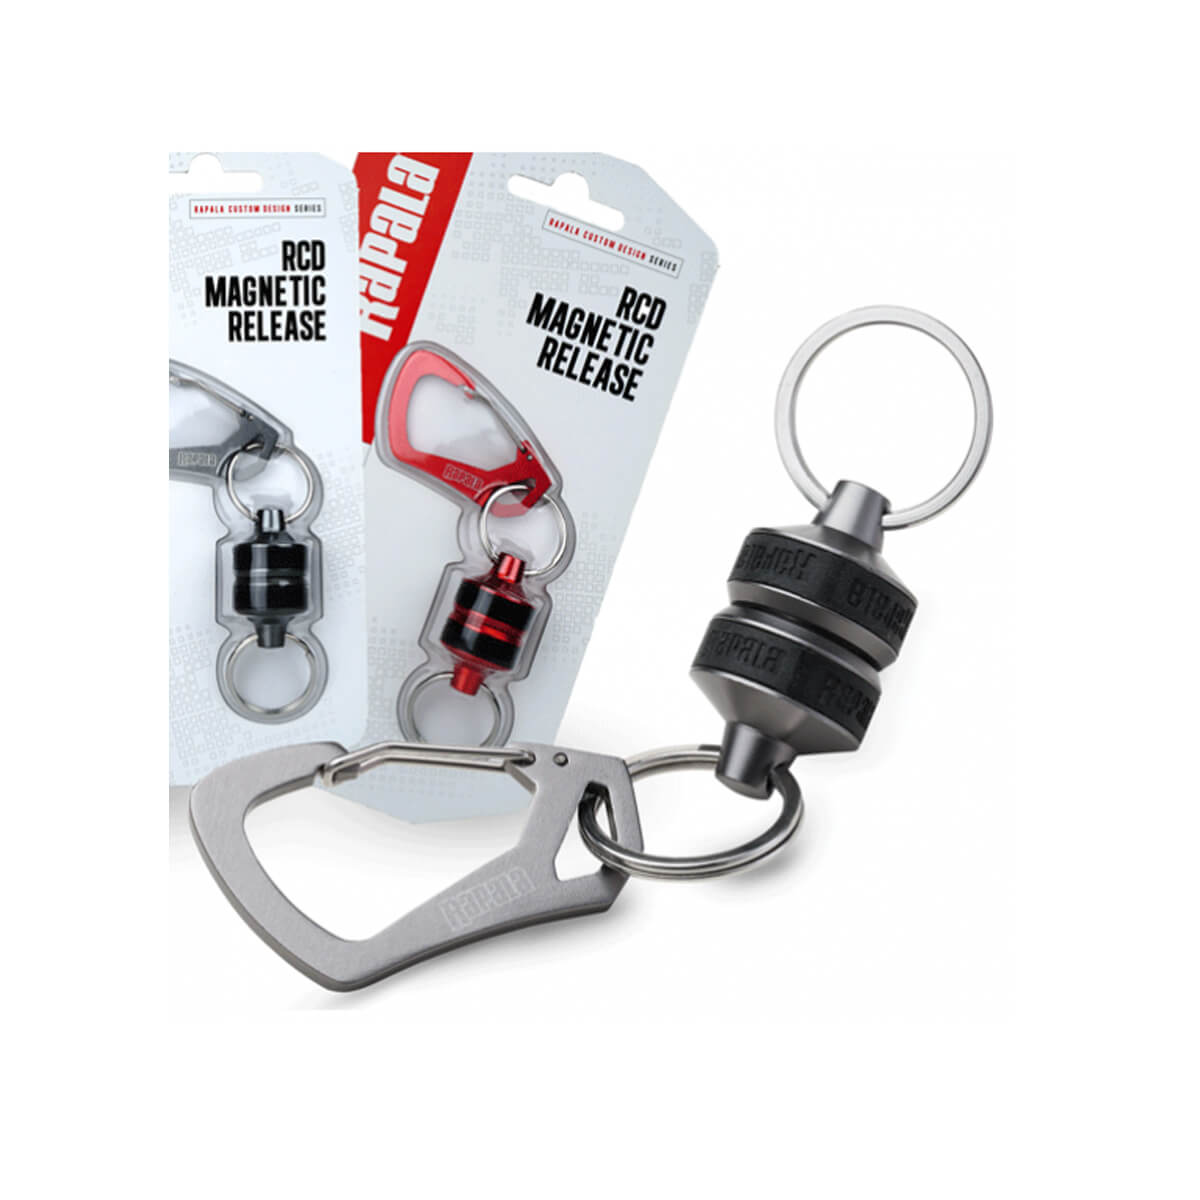 Suporte Custom Magnético Rapala  - Pró Pesca Shop